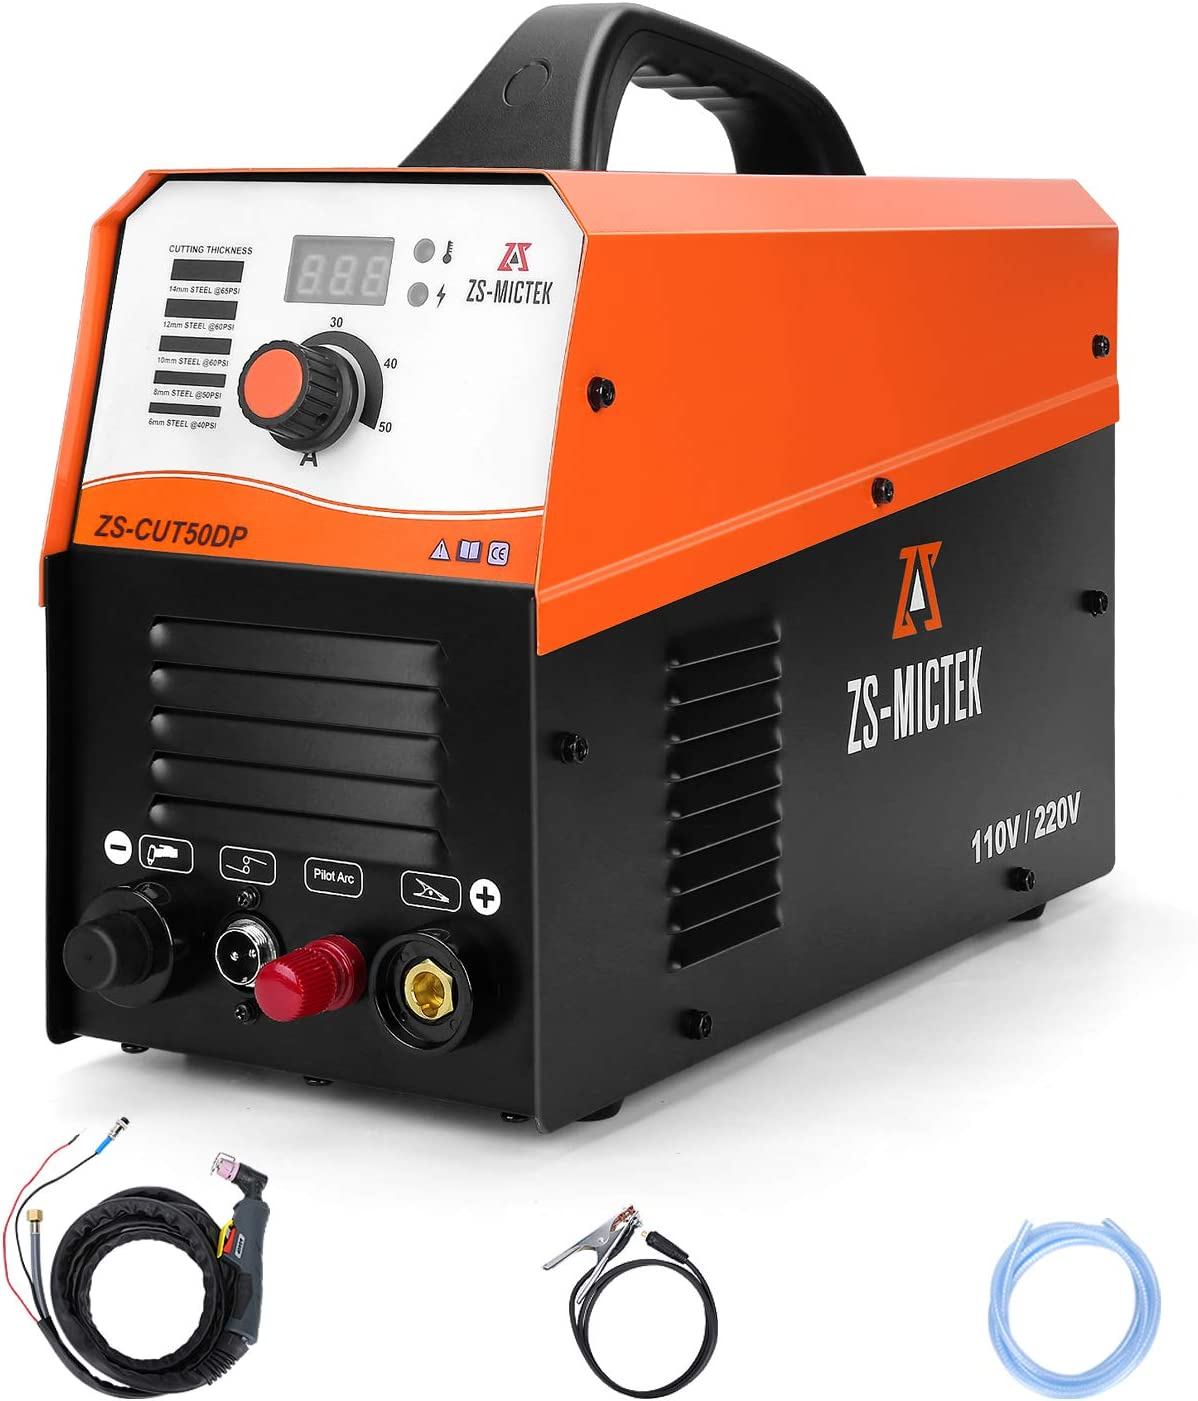 Plasma Spasm price Cutter Non-Touch Pilot Arc 50Amp Clean Cut 1 220V 110 Quality inspection 2''